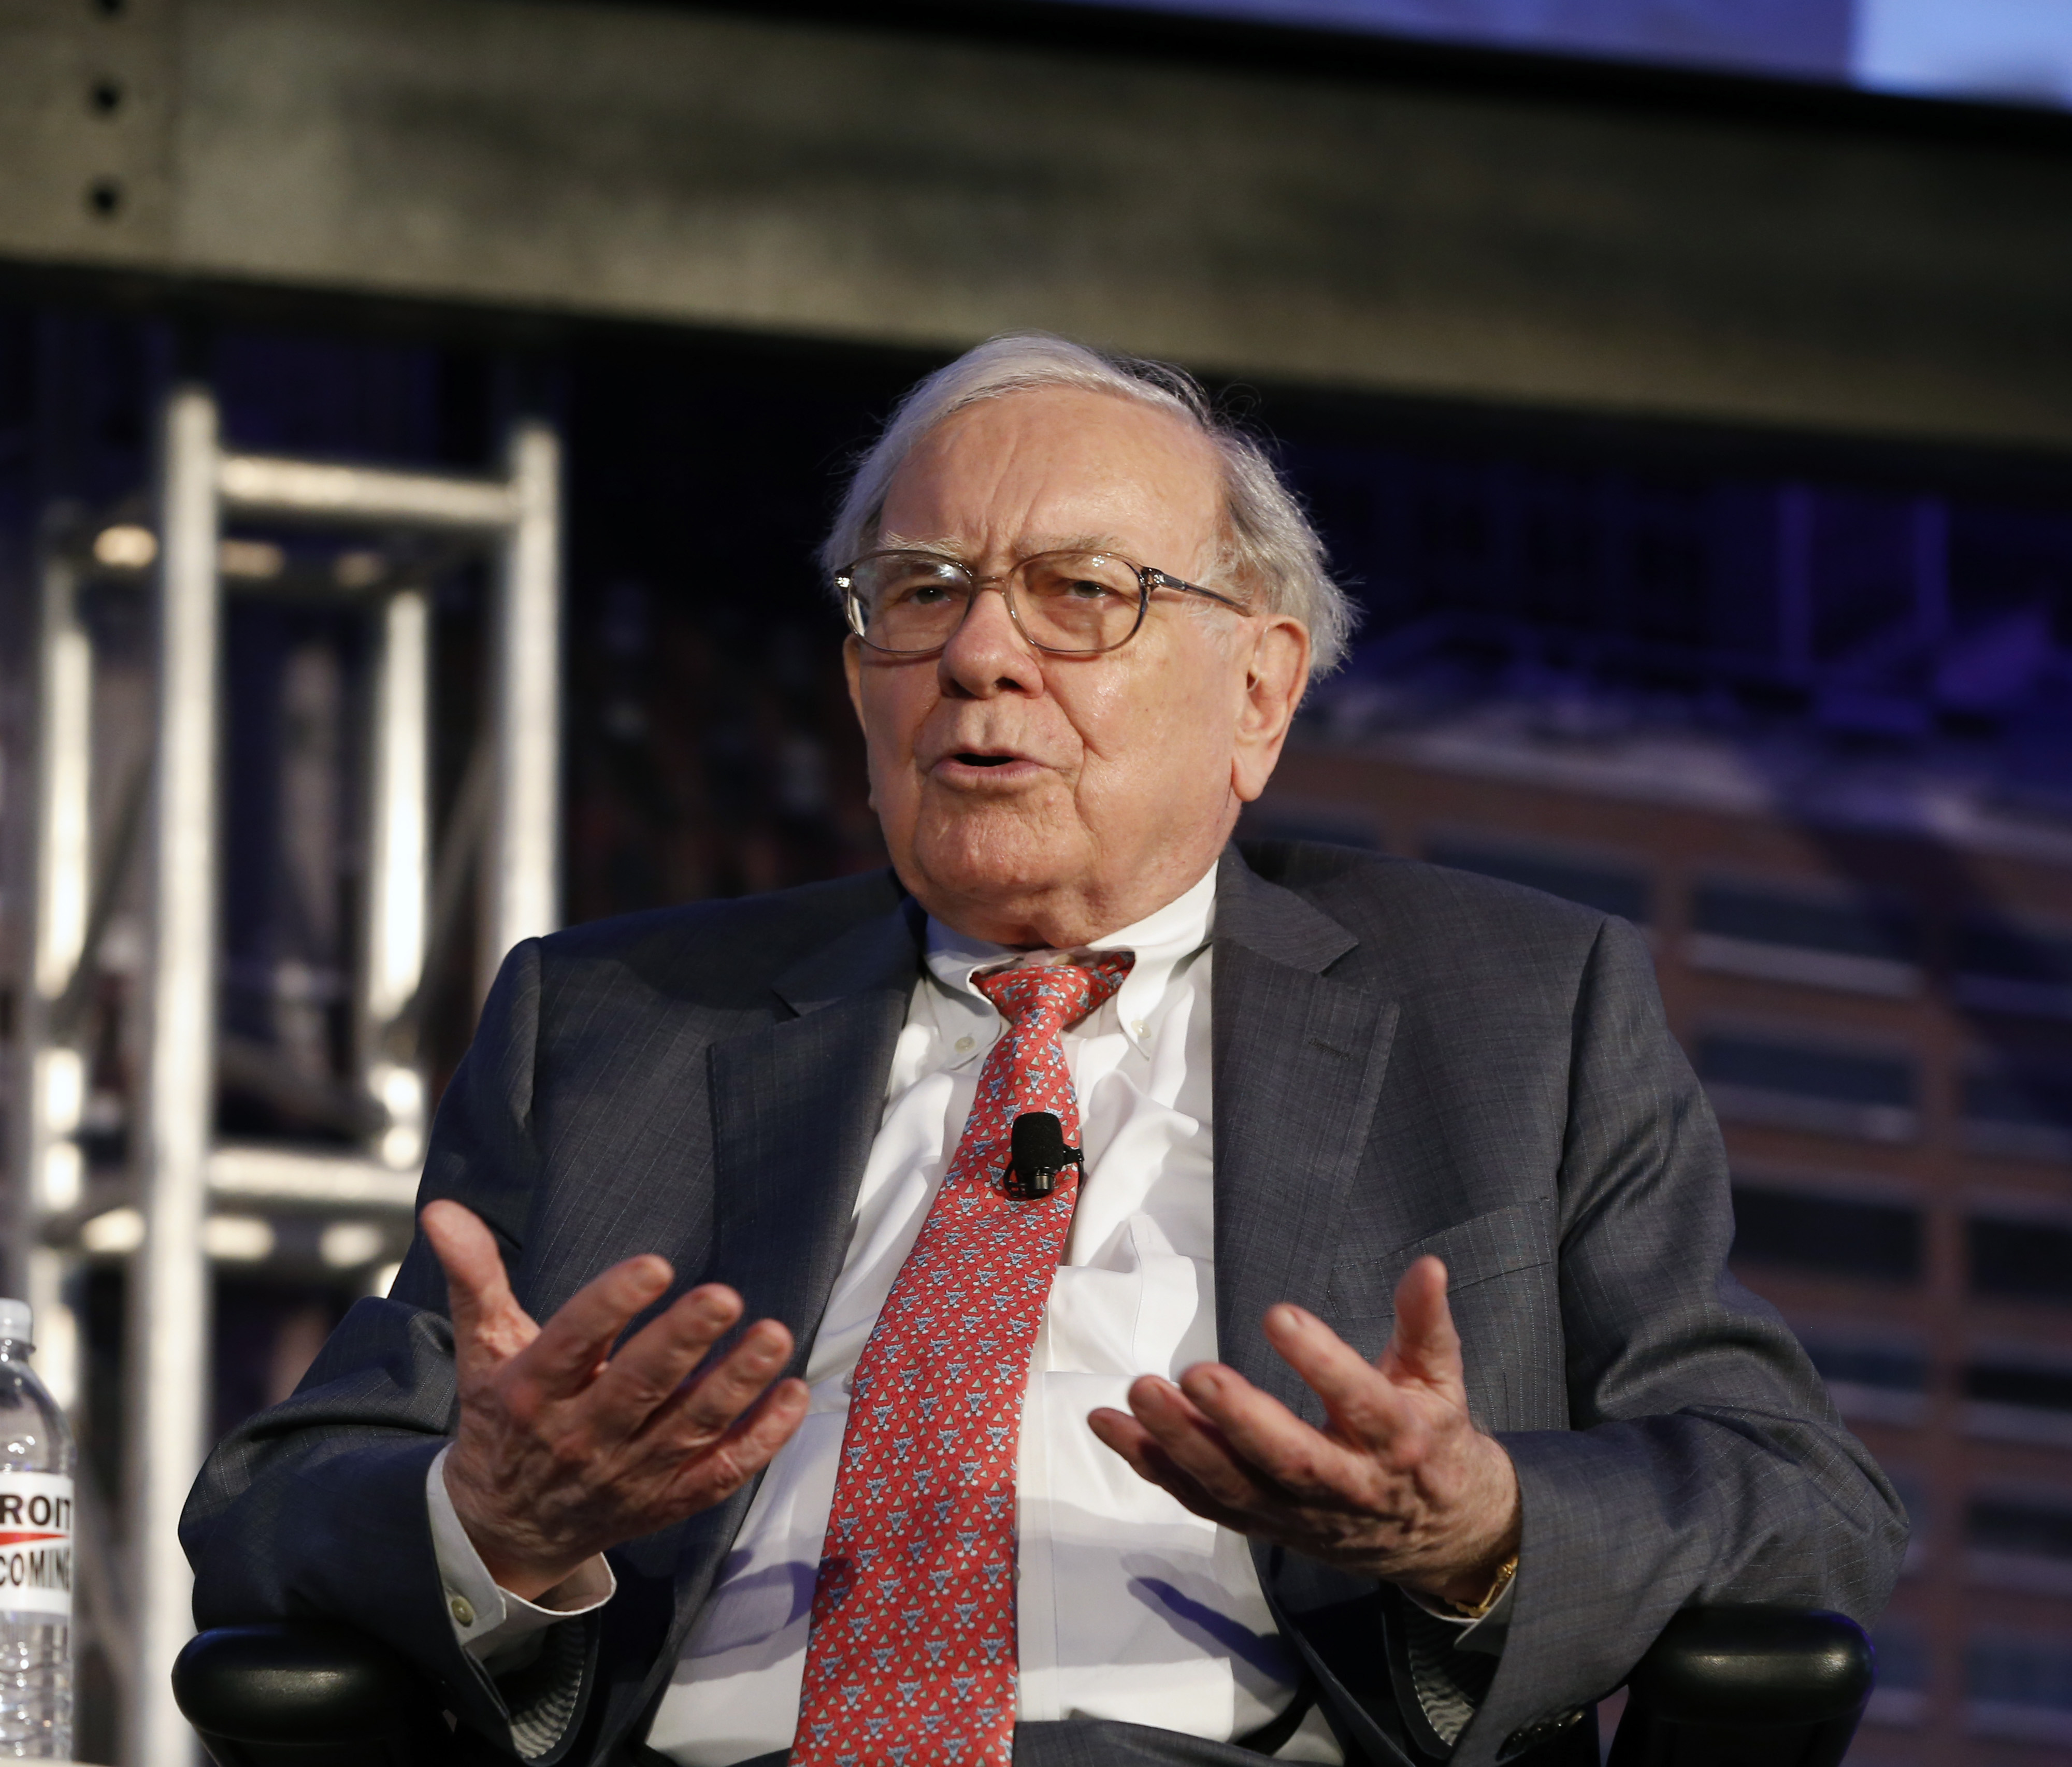 Interview With Lloyd Blankfein,Warren Buffett, Michael Bloomberg & Michigan Governor Rick Snyder